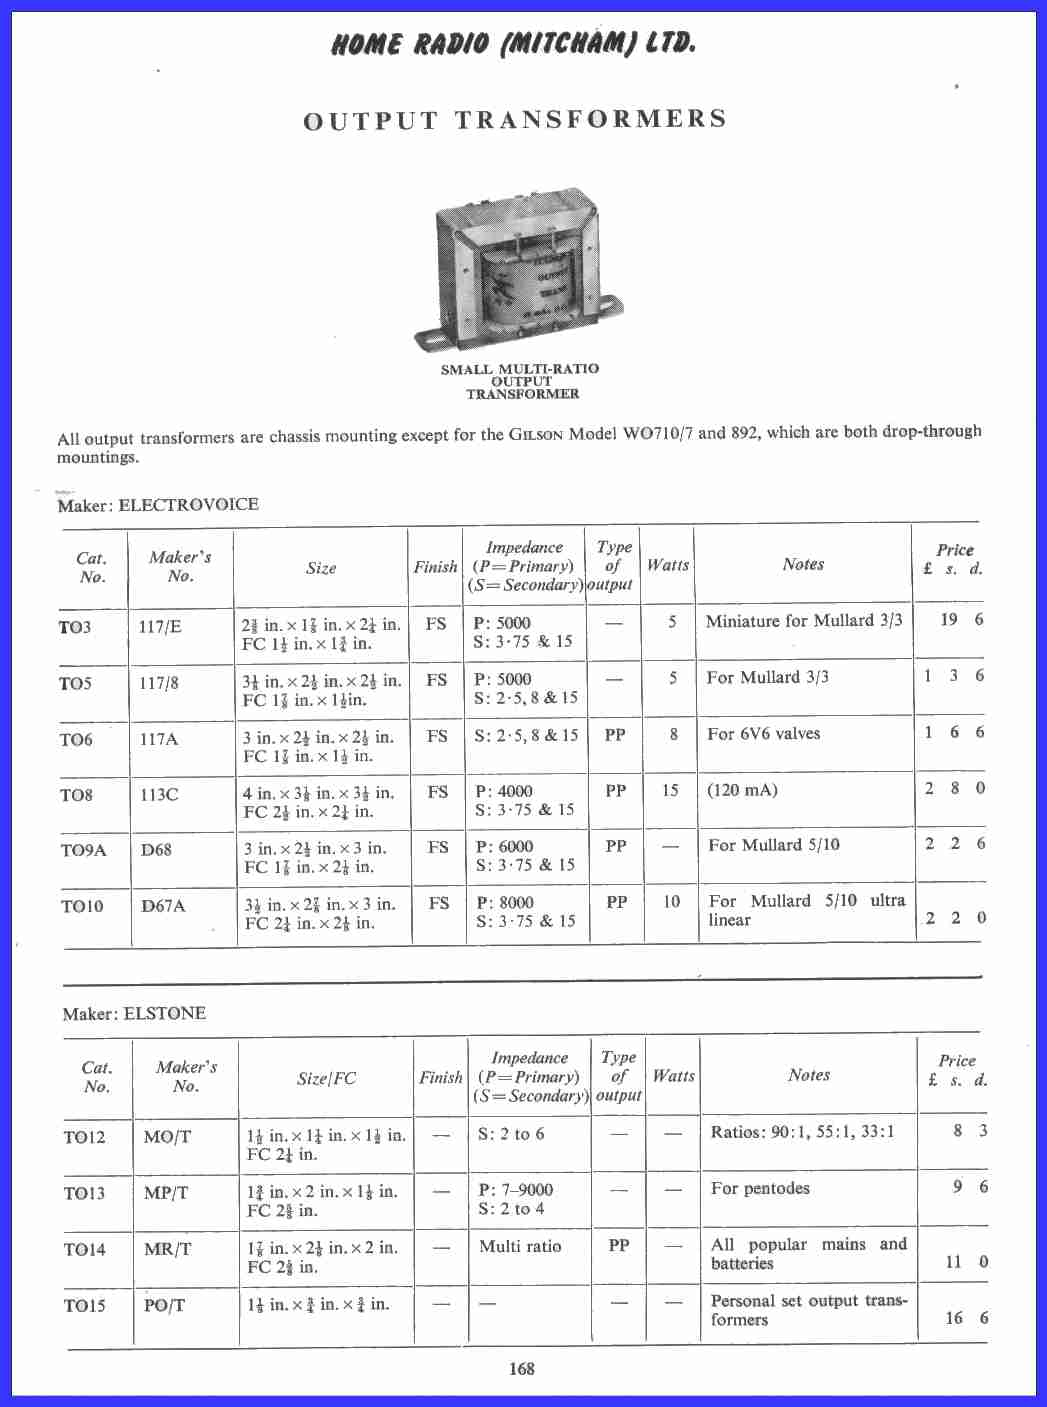 Vintage Radio And Electronics Home Radio Catalogue